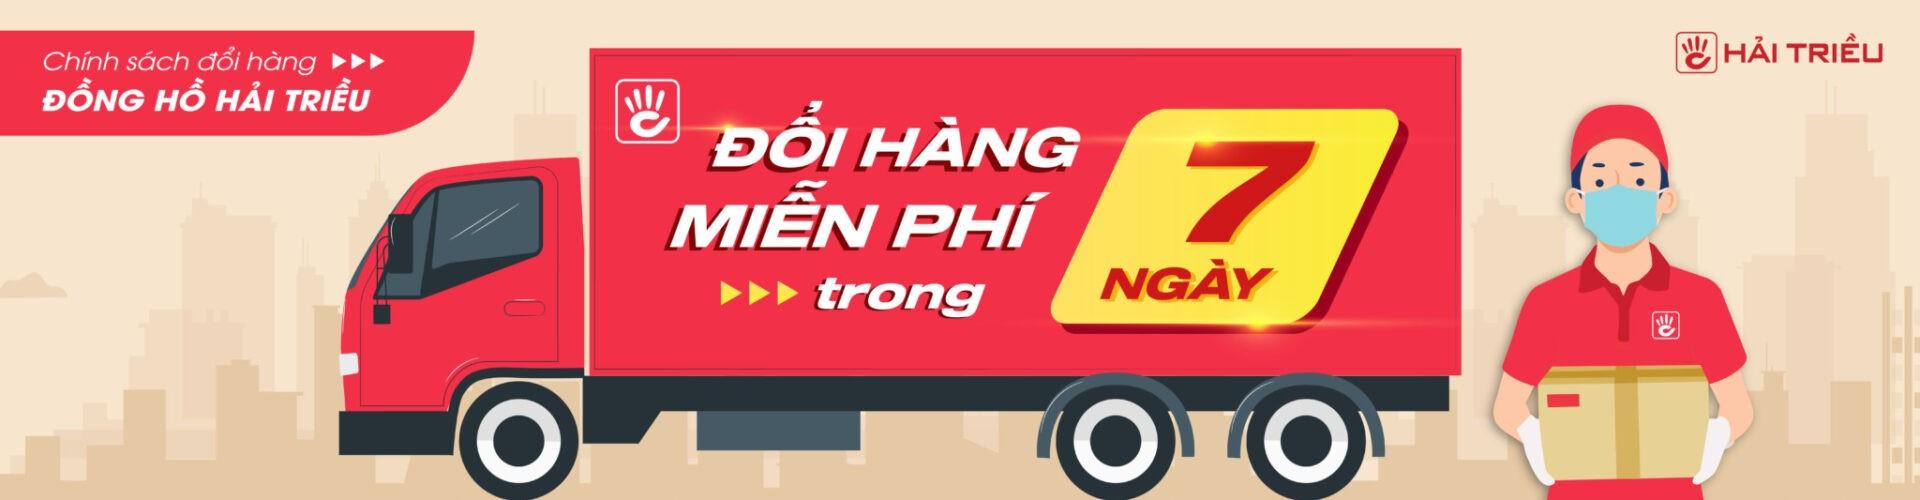 chinh sach doi hang tai dong ho hai trieu